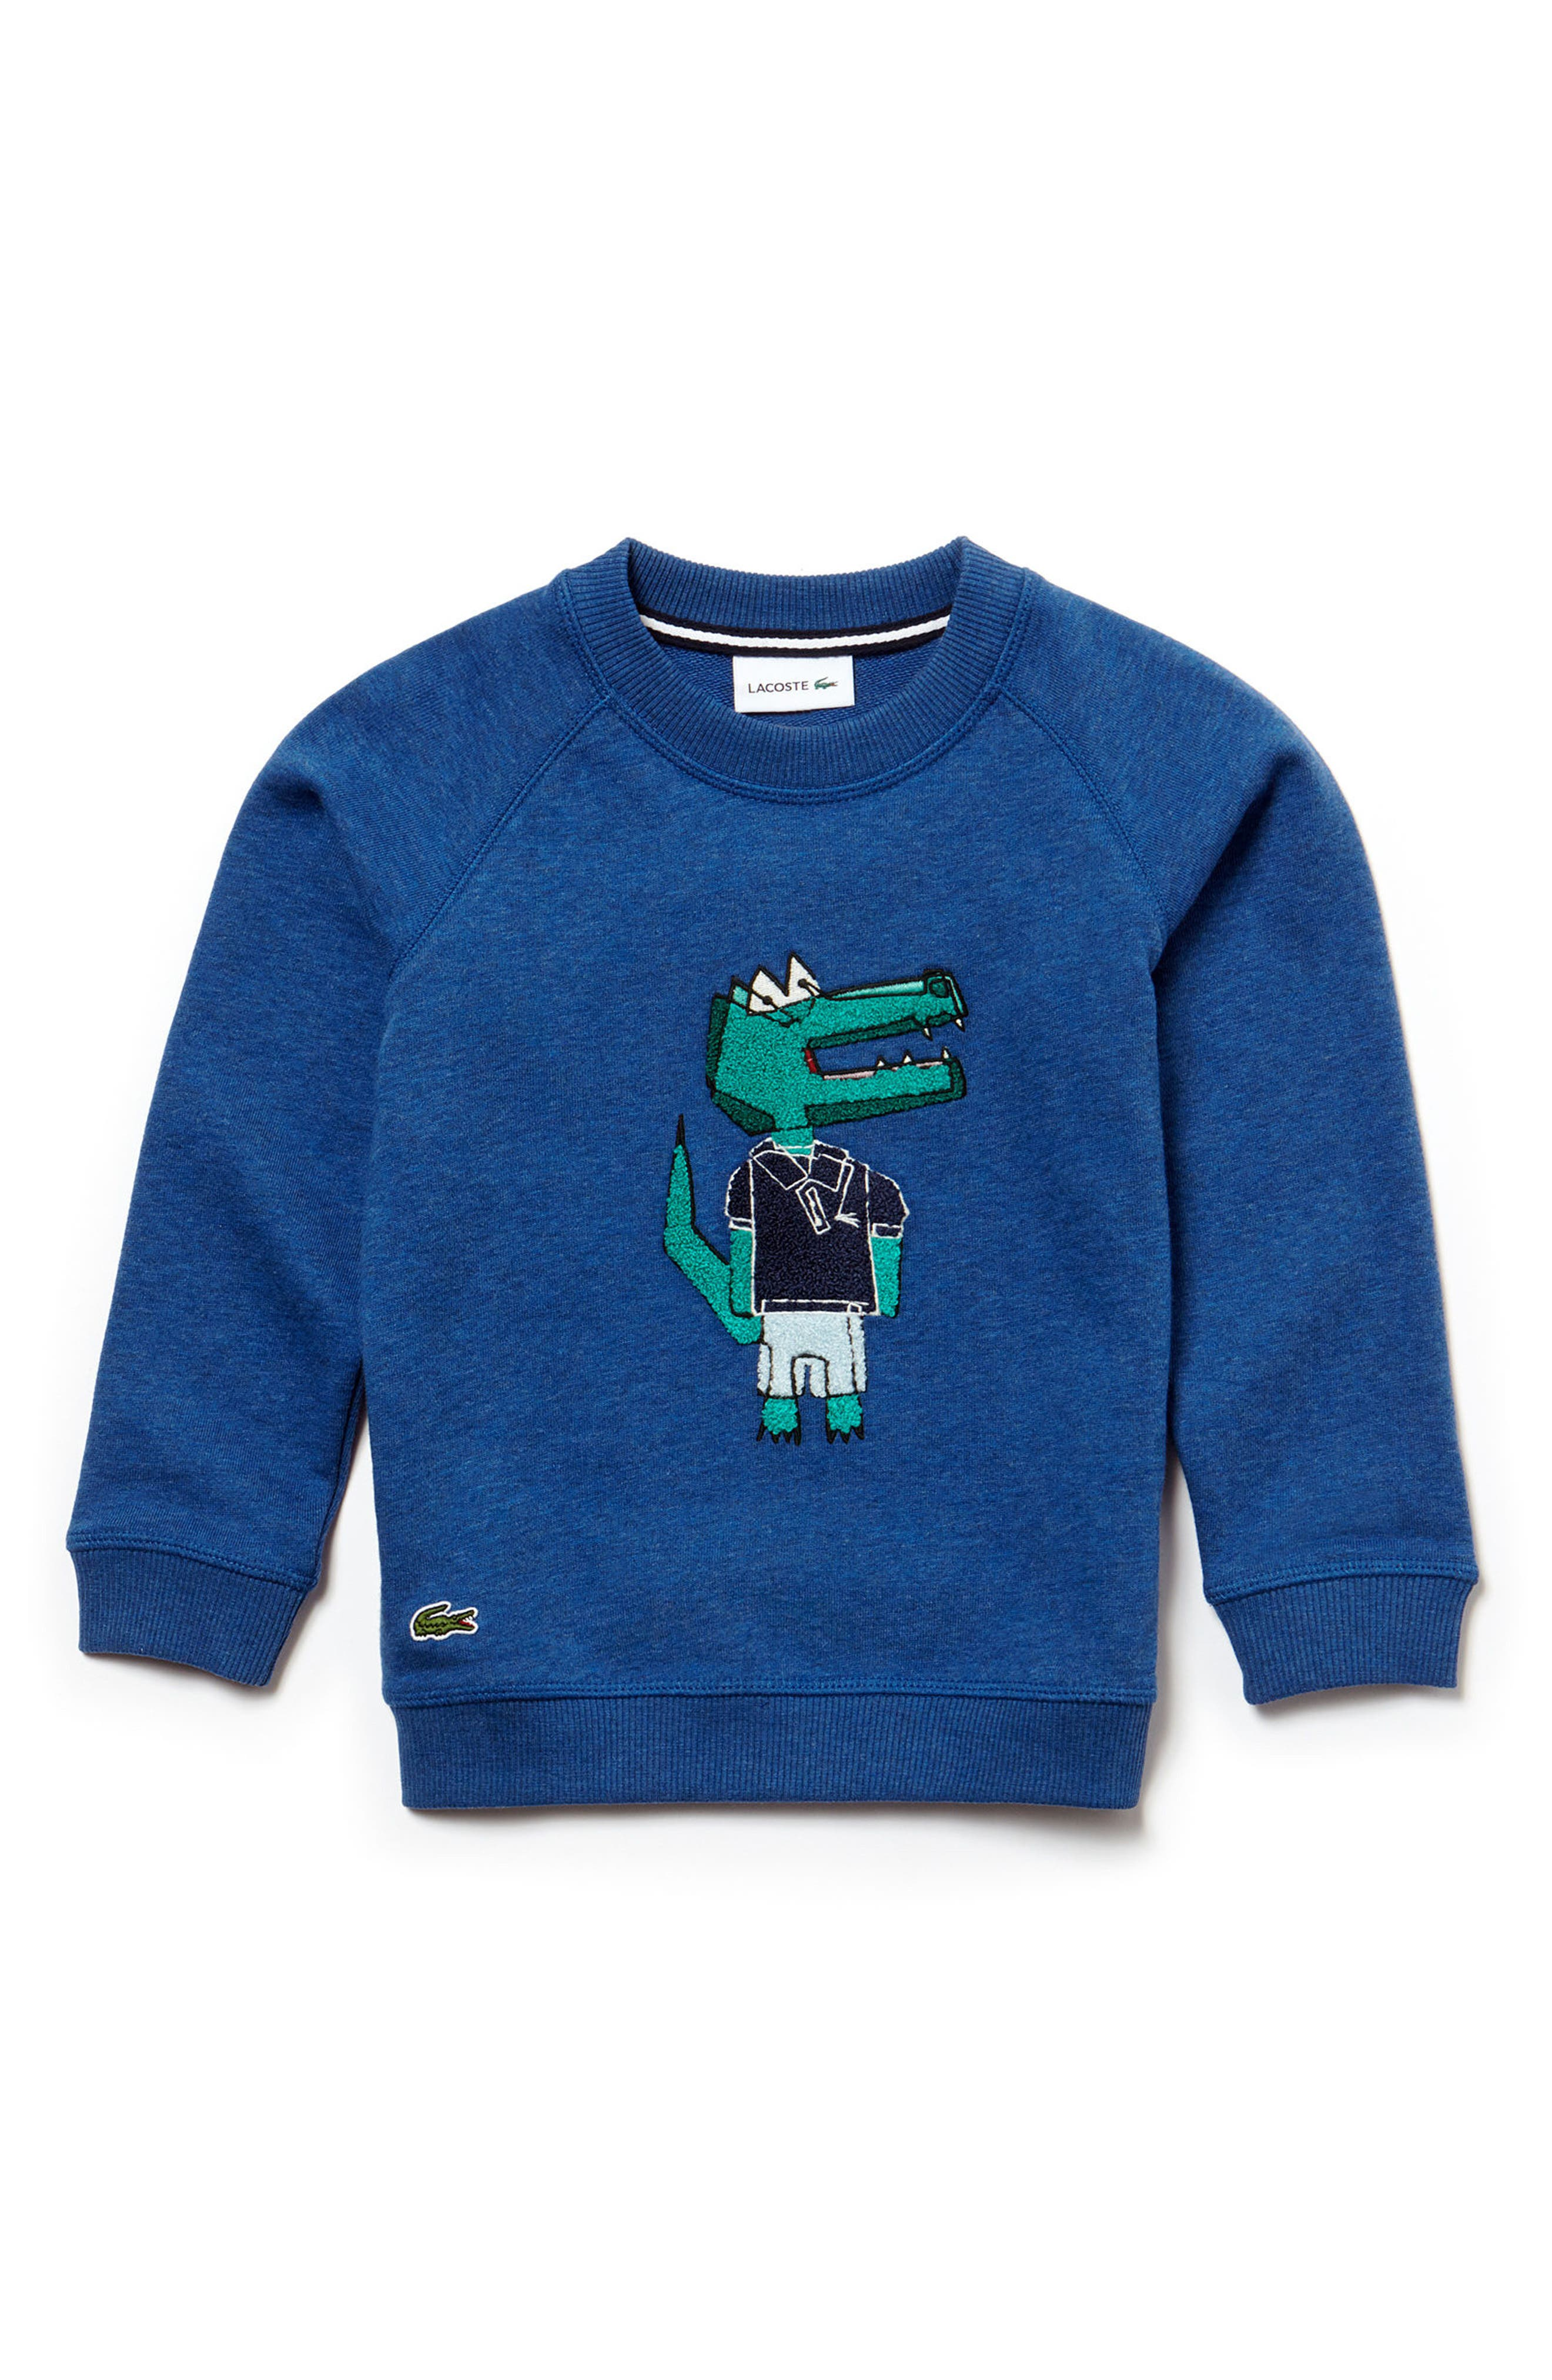 Crocodile Sweater,                             Main thumbnail 1, color,                             400